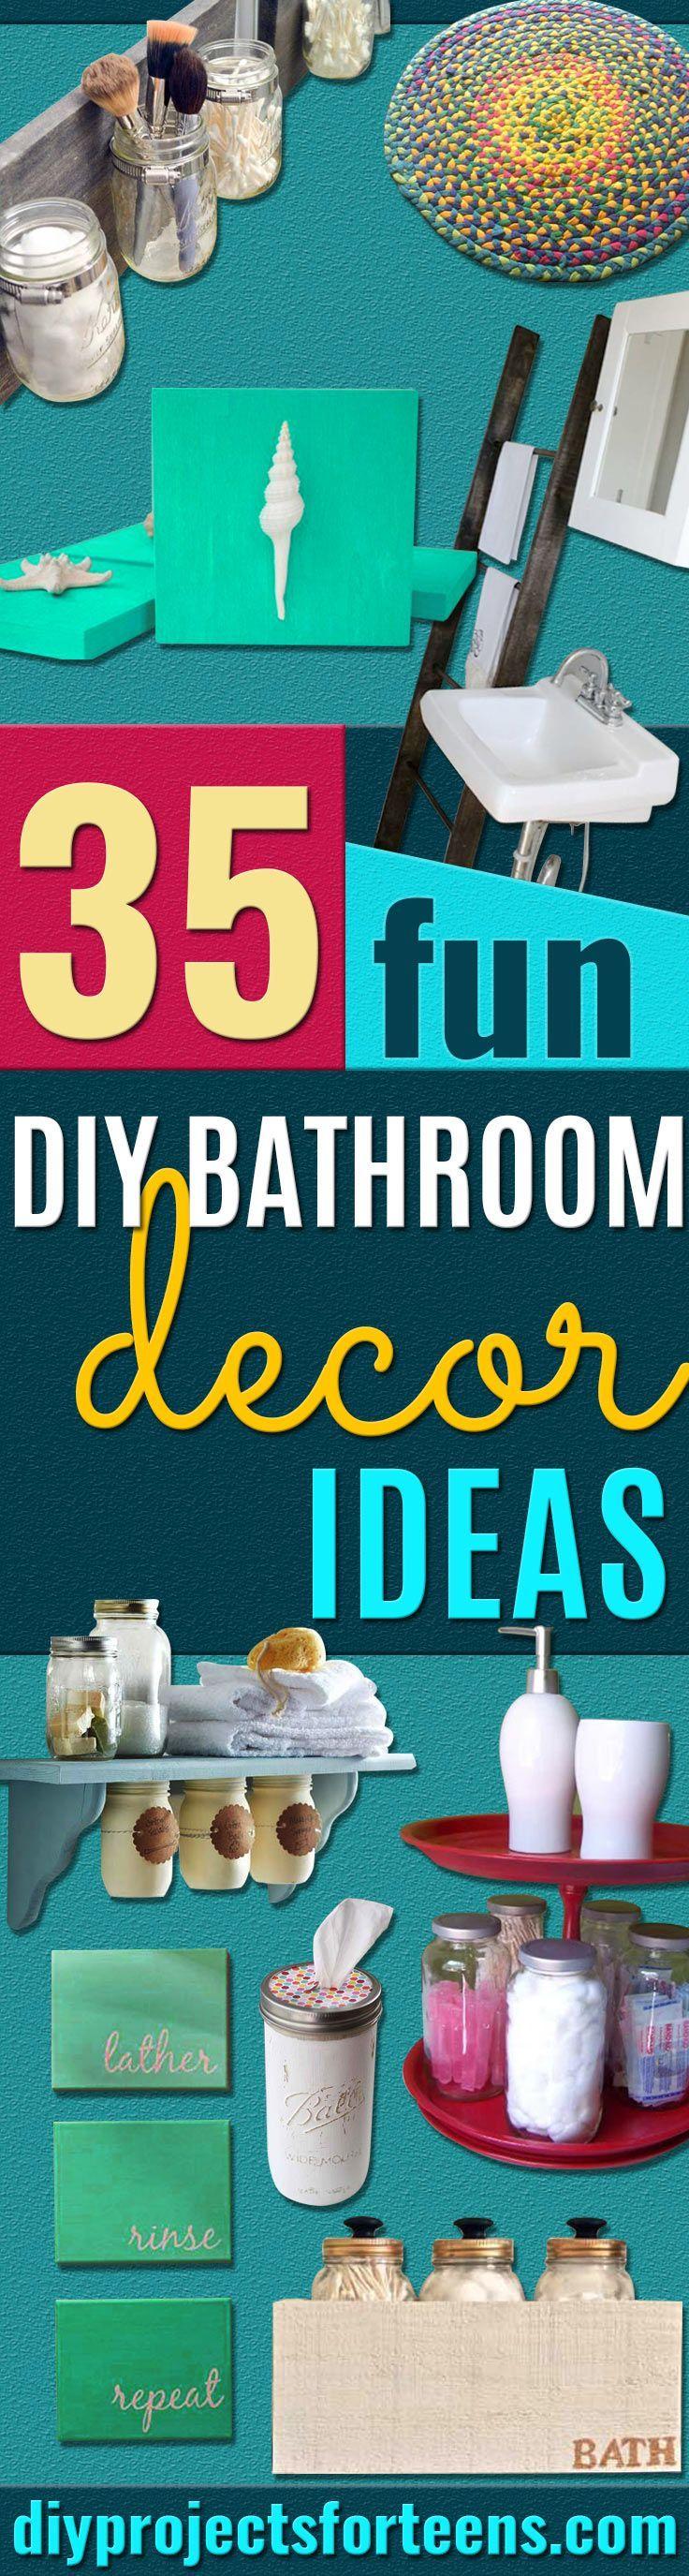 35 fun diy bathroom decor ideas you need right now - Decorating On A Dime